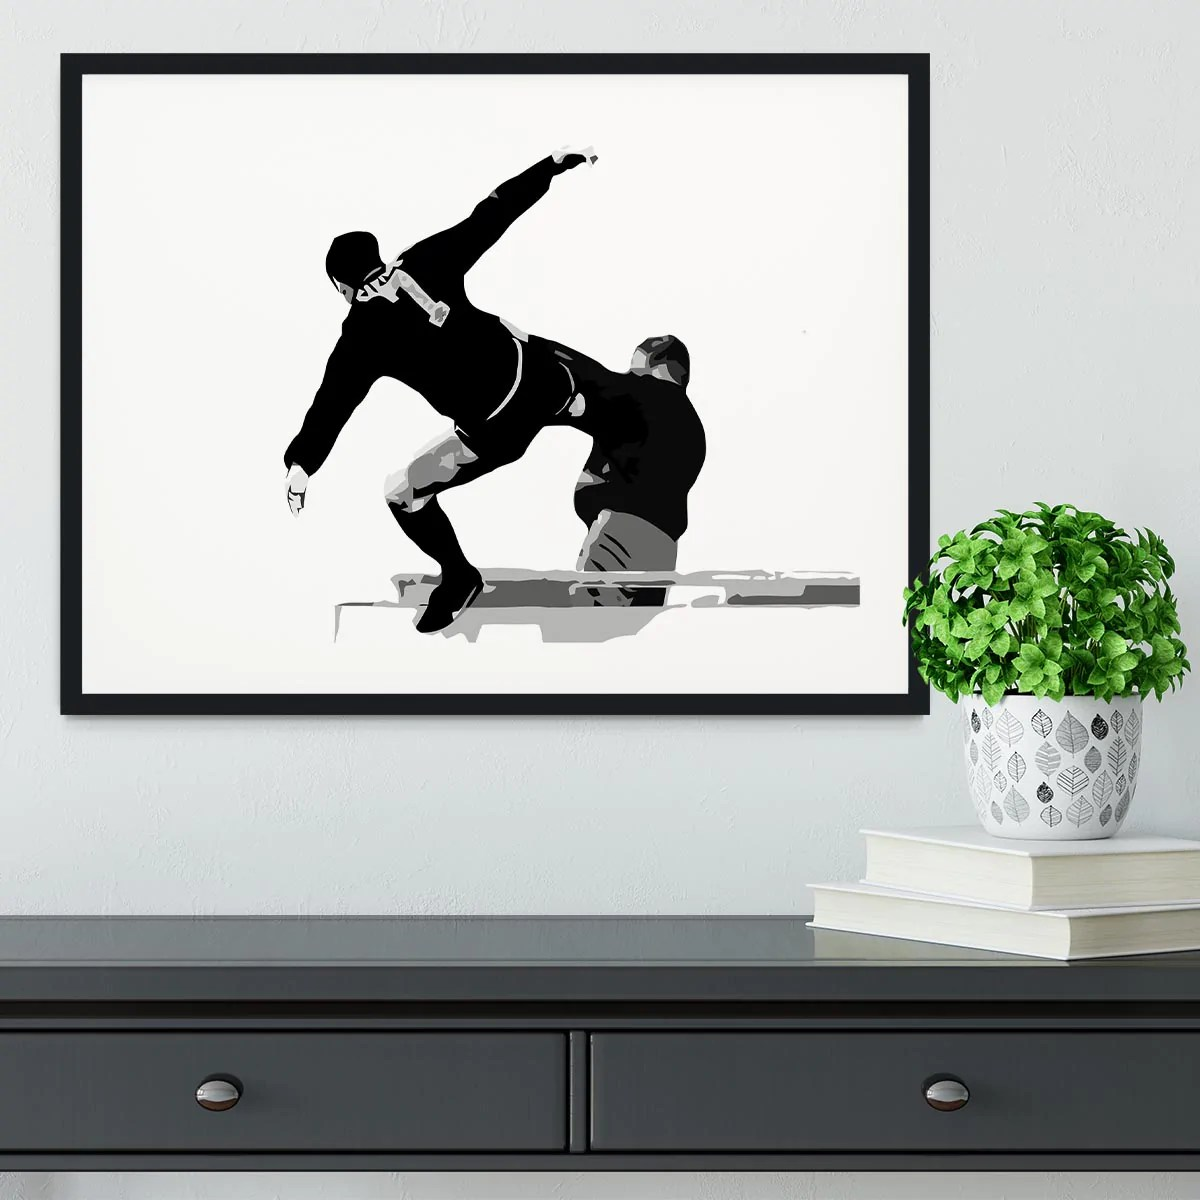 The kick of the king (eric cantona) art print. Eric Cantona Kick Framed Print Canvas Art Rocks